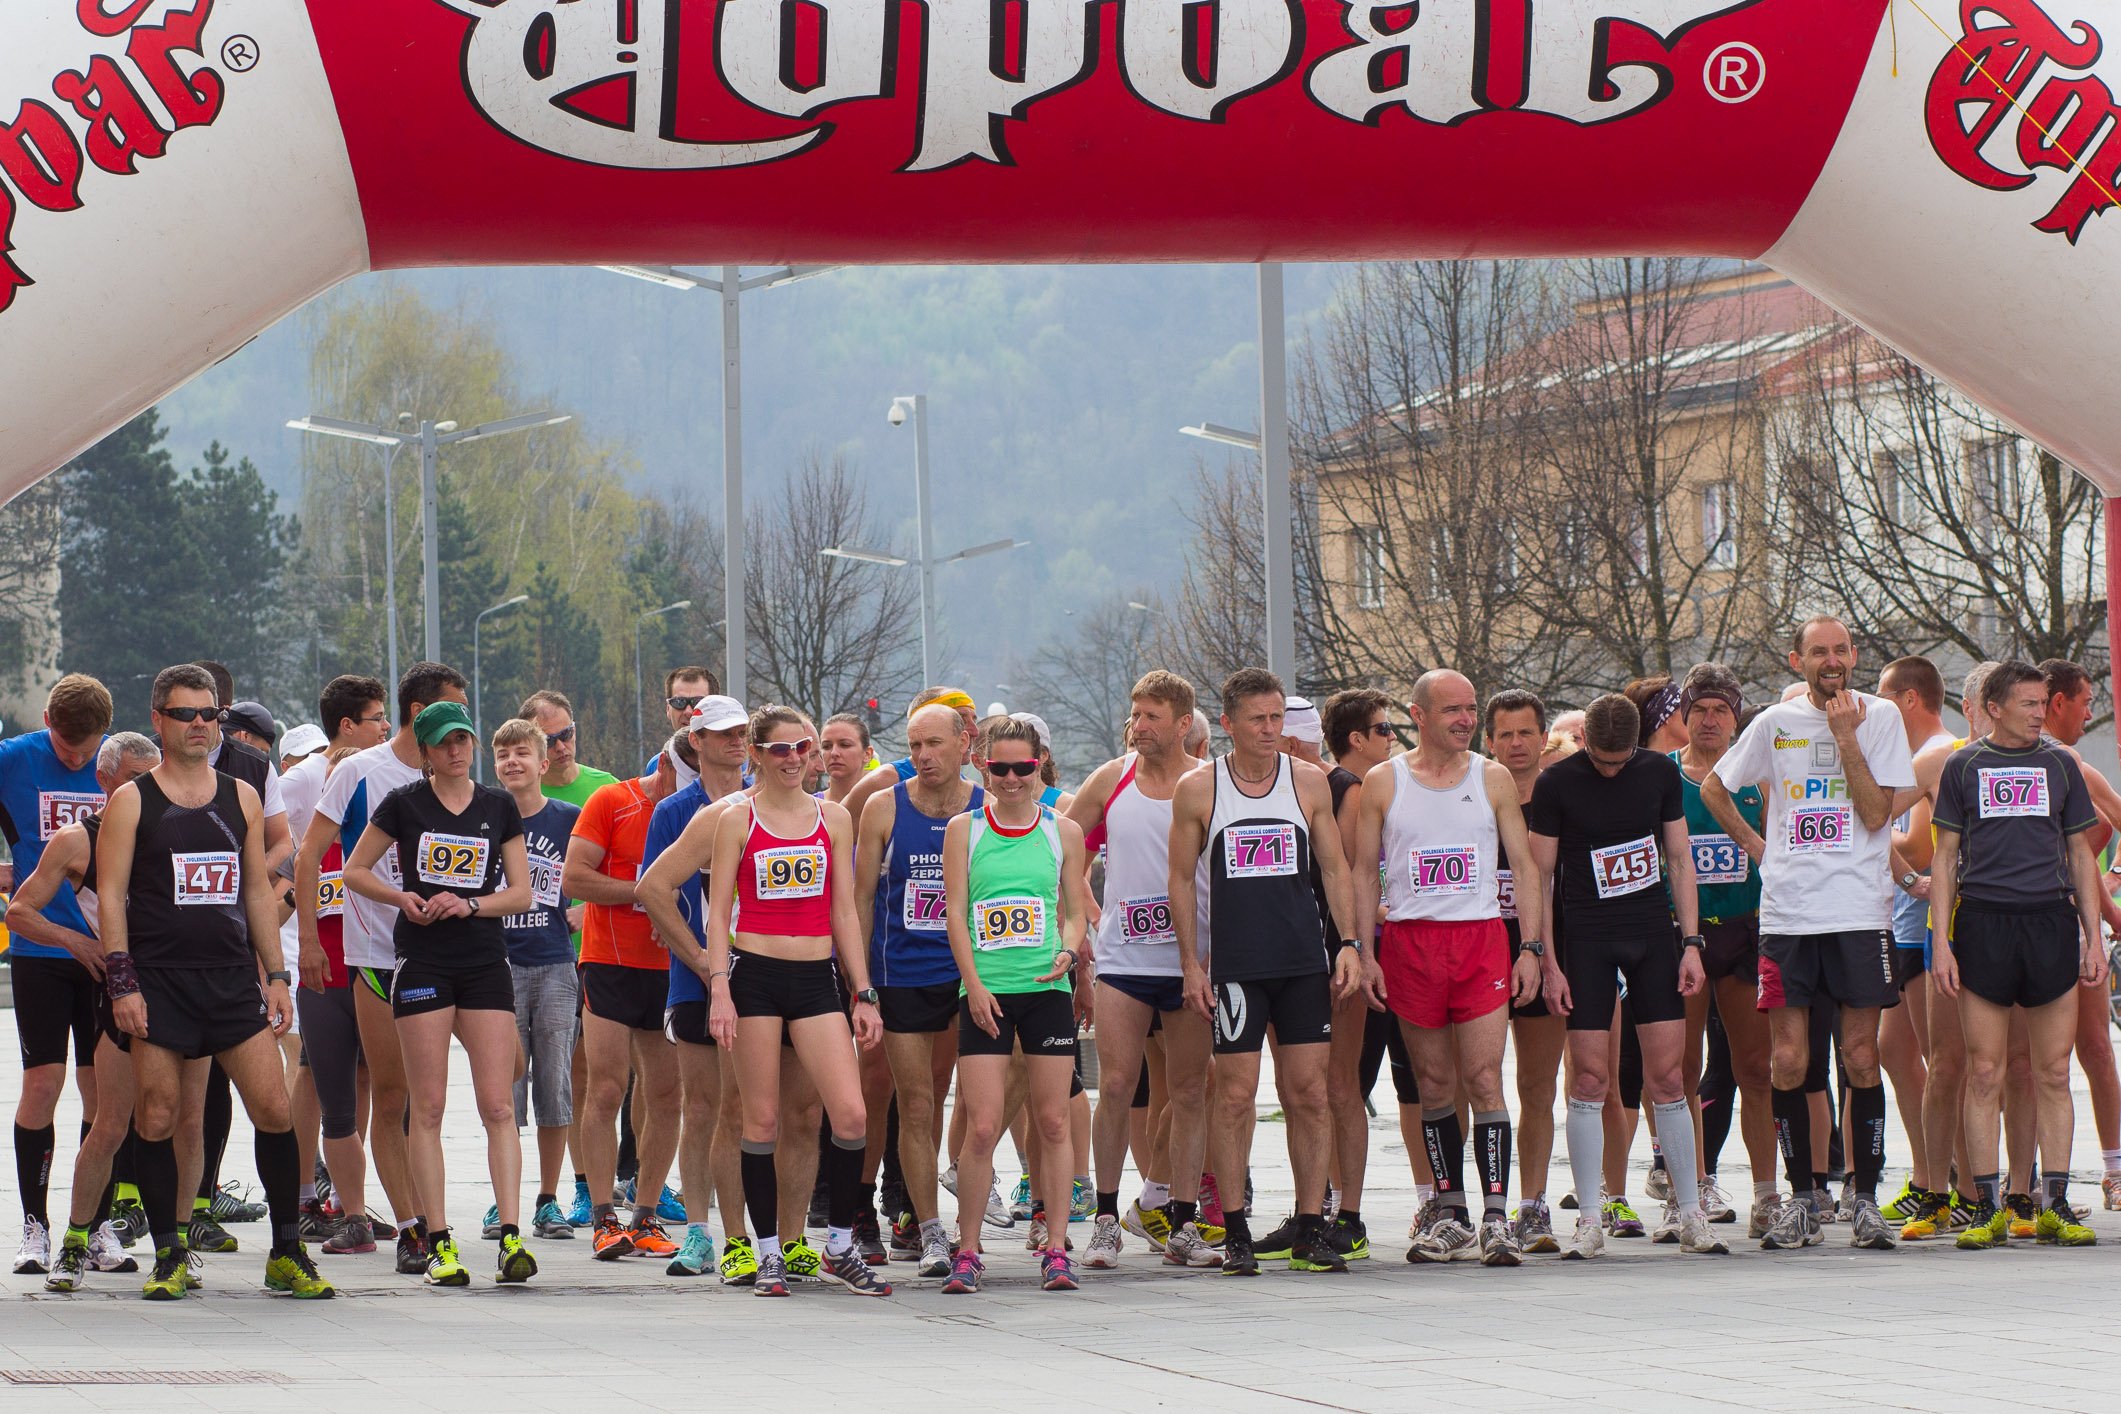 zvolenska-corrida-2014-11-rocnik-52